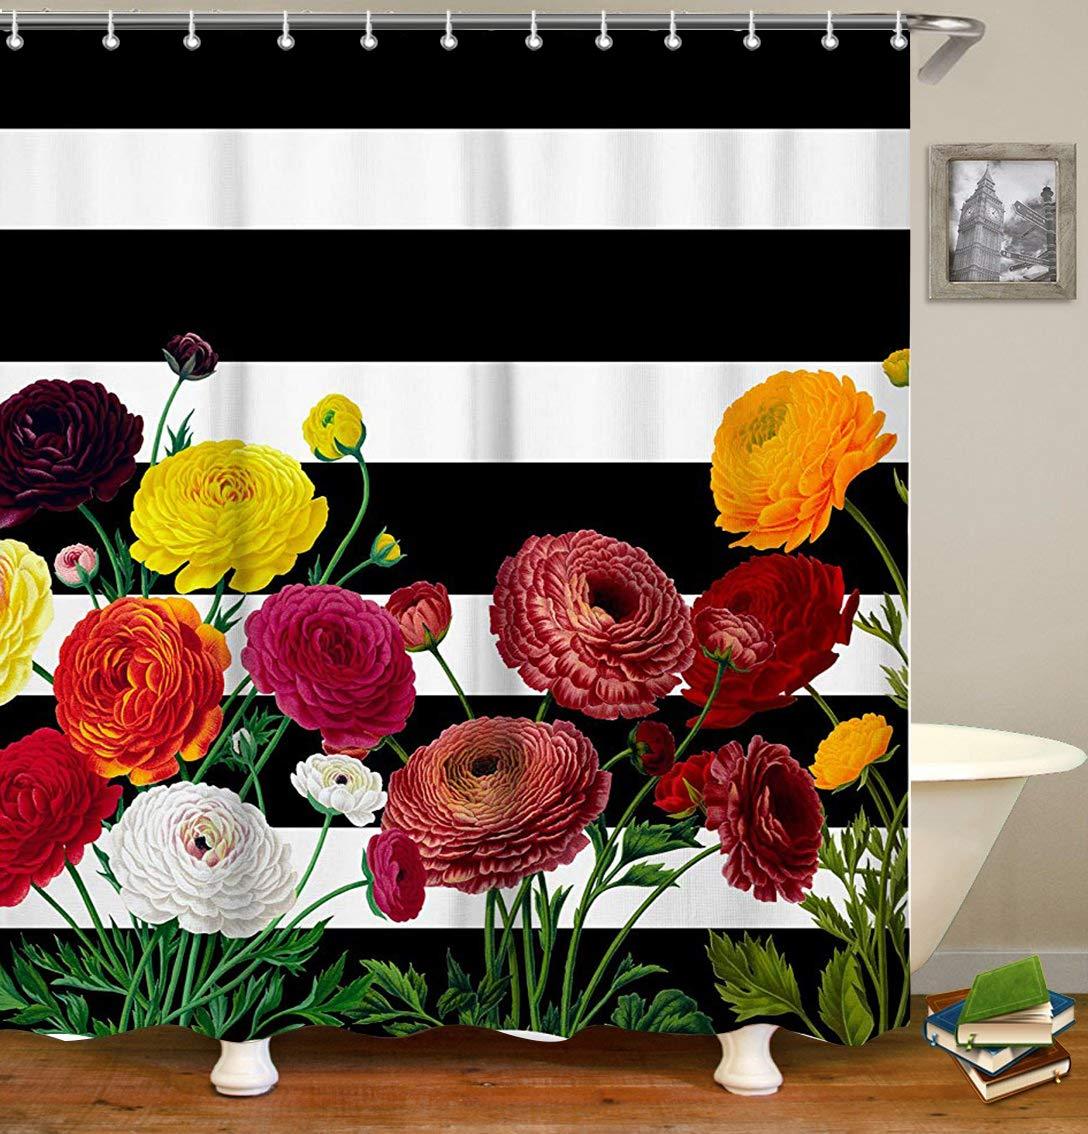 Livilan Waterproof Fabric Shower Curtain Set 70.8'' x 70.8'' Retro Red Flowers & Black White Stripes Pattern Decorative Thick Bathroom Curtain